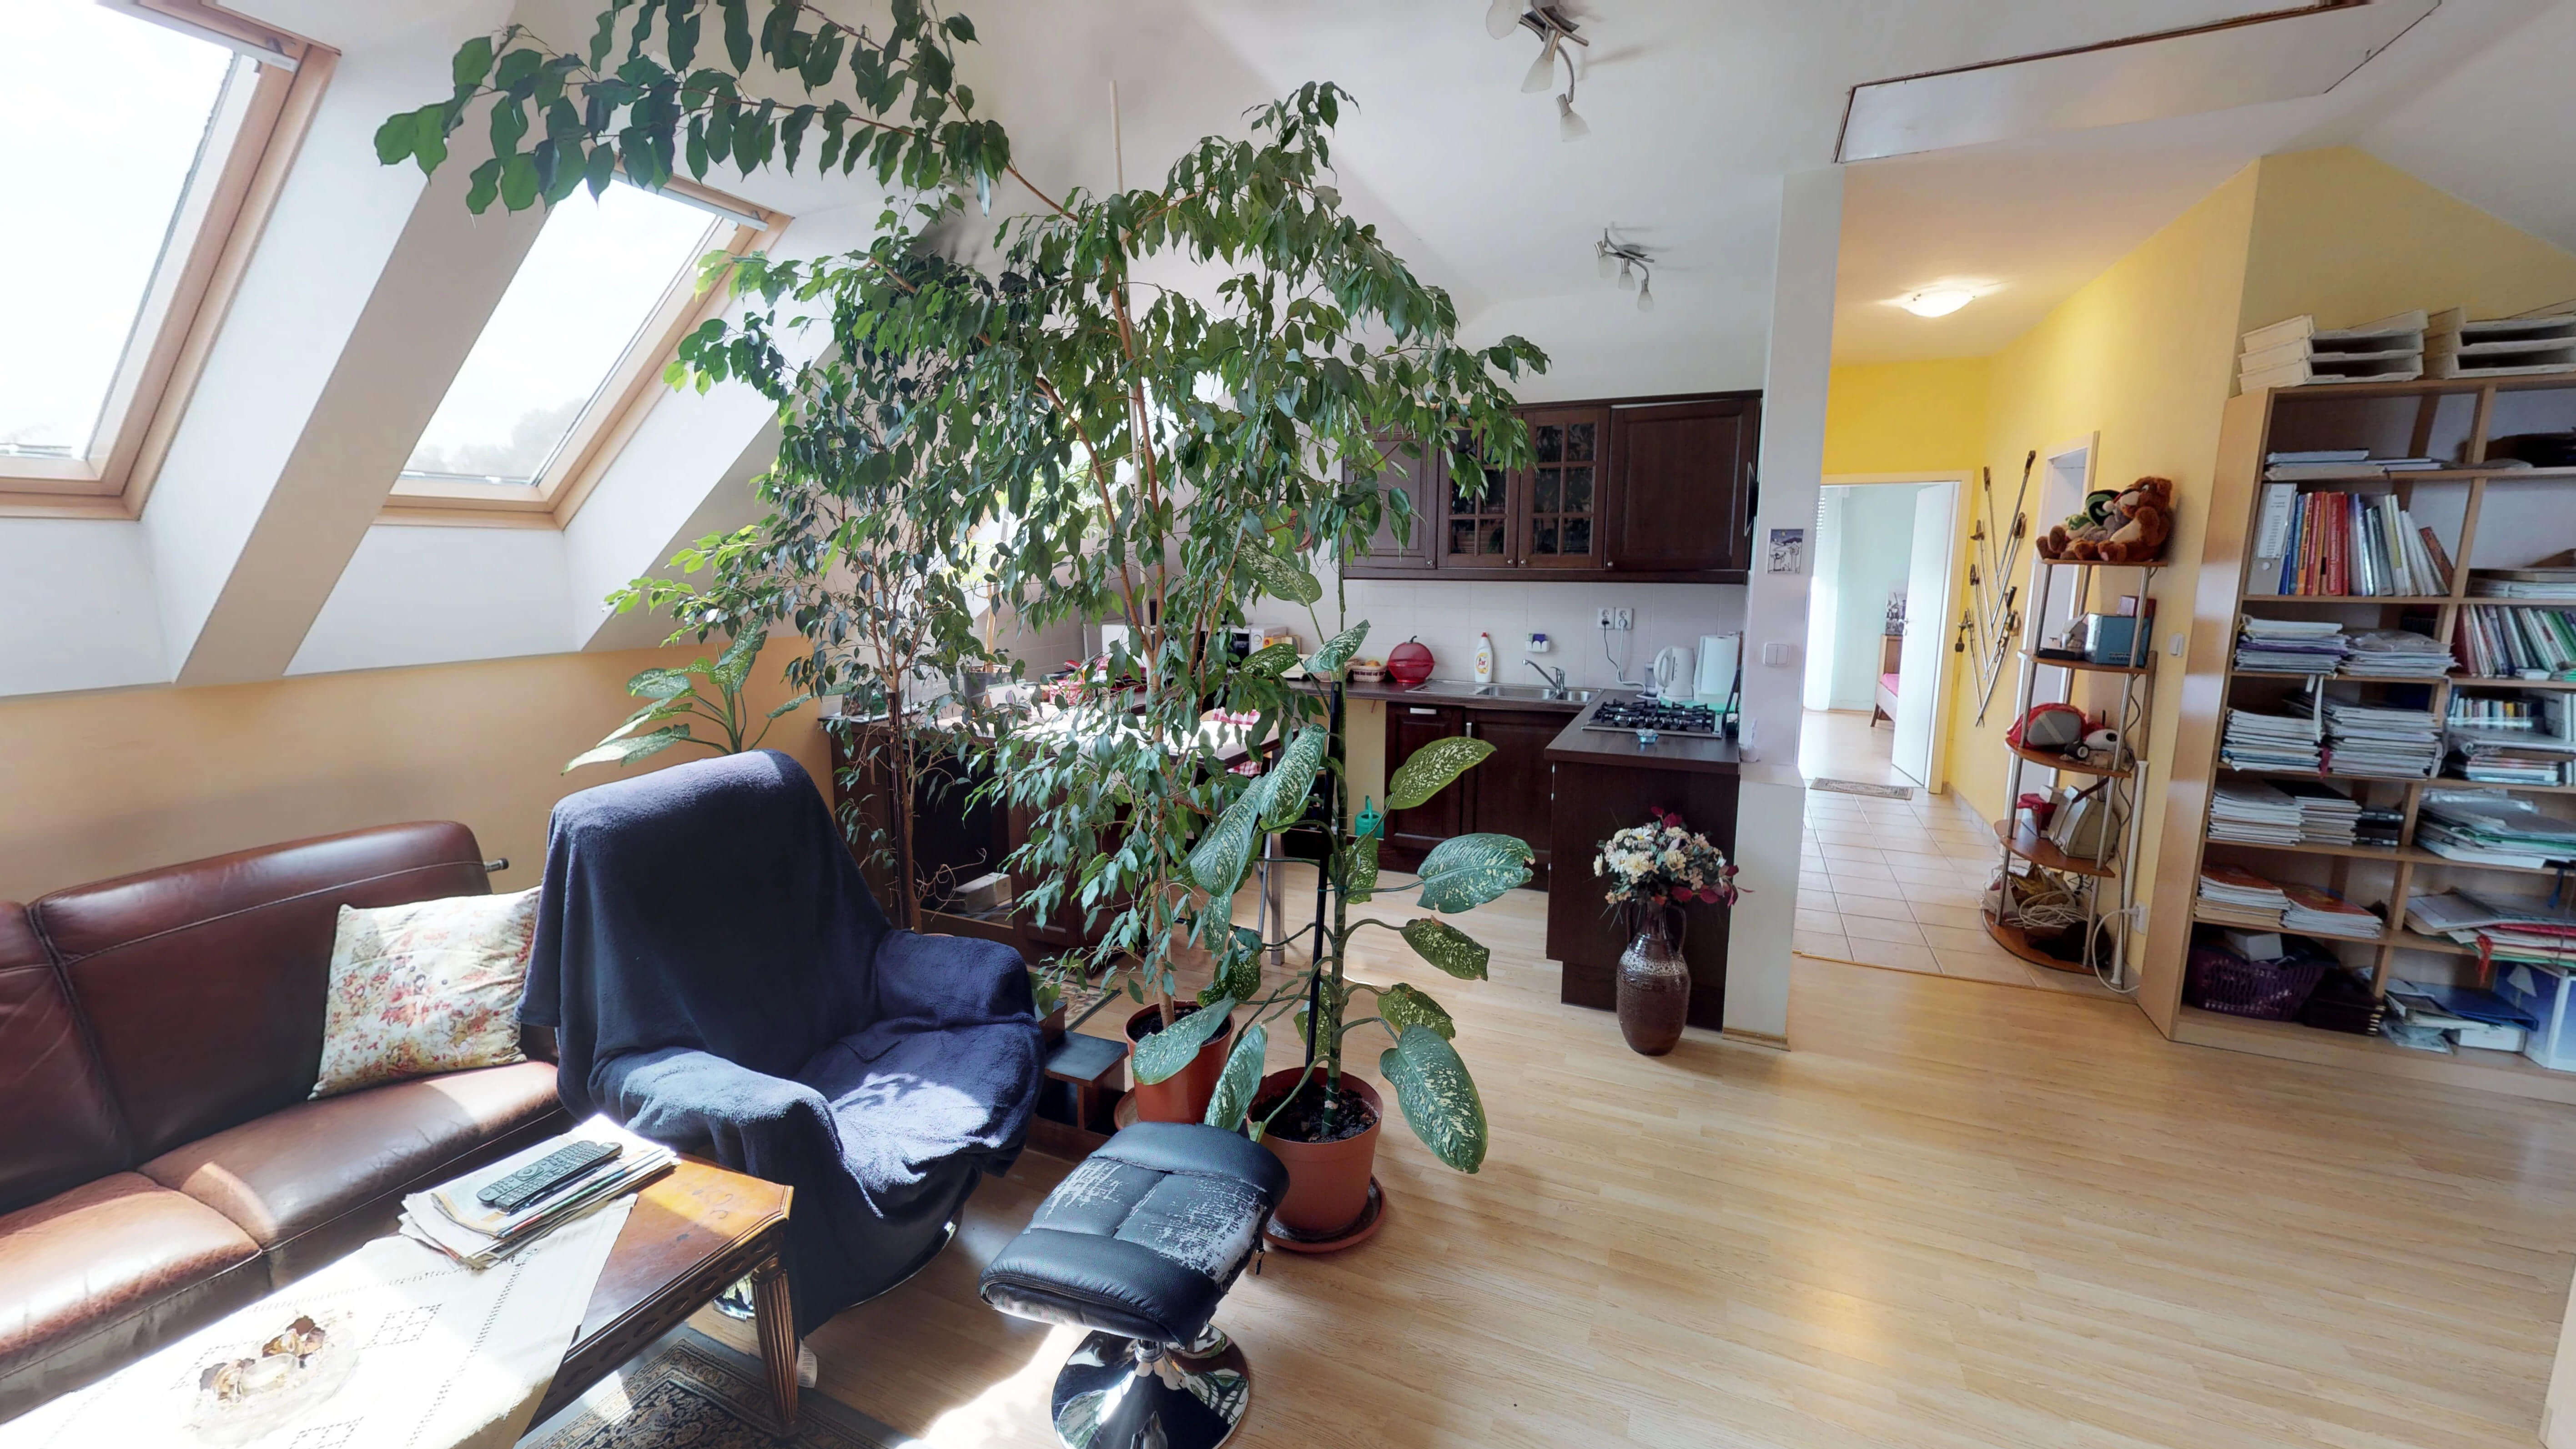 Rodinný dom na uzavretej ulici, Vojtechovce, 2 – generačný 6 izbový, úžitková 270m2, pozemok 600m2, garáž-8